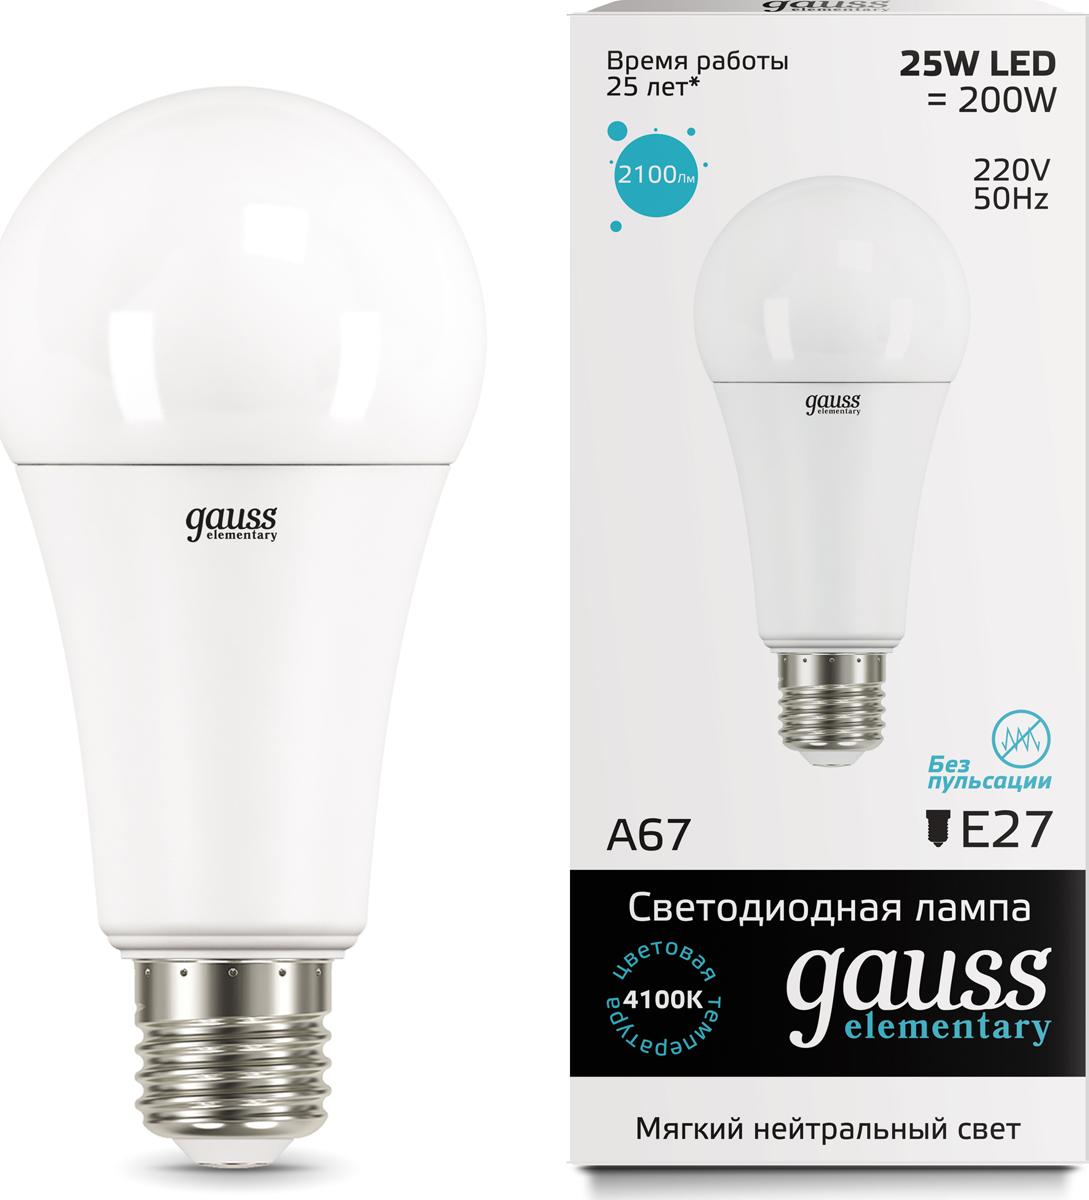 "Лампа светодиодная Gauss ""LED Elementary"", A67, 25W, E27, 4100K, 1/10/50"